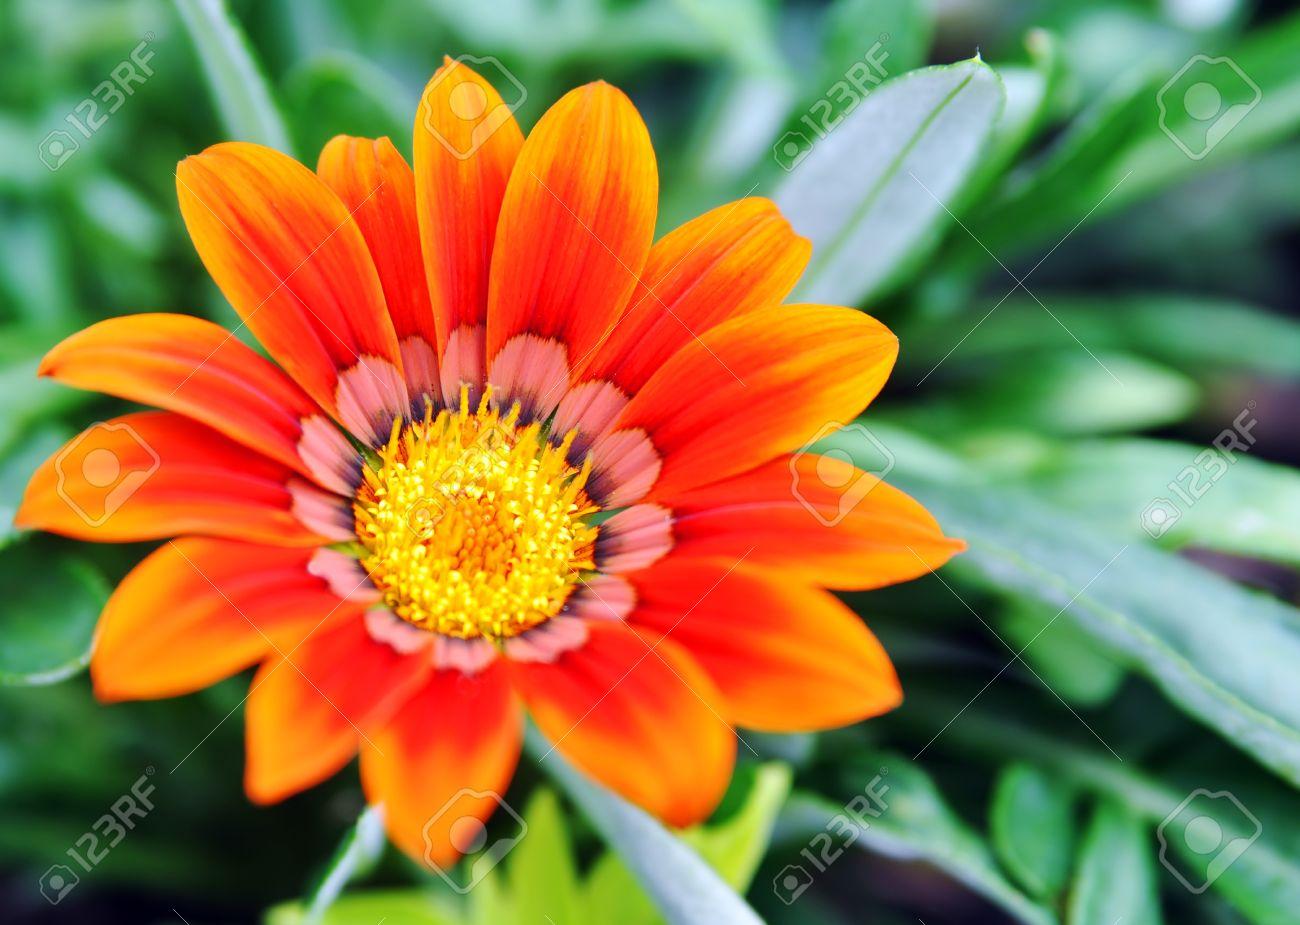 Orange Flower Gazania Pavonia Closeup Stock Photo, Picture And.